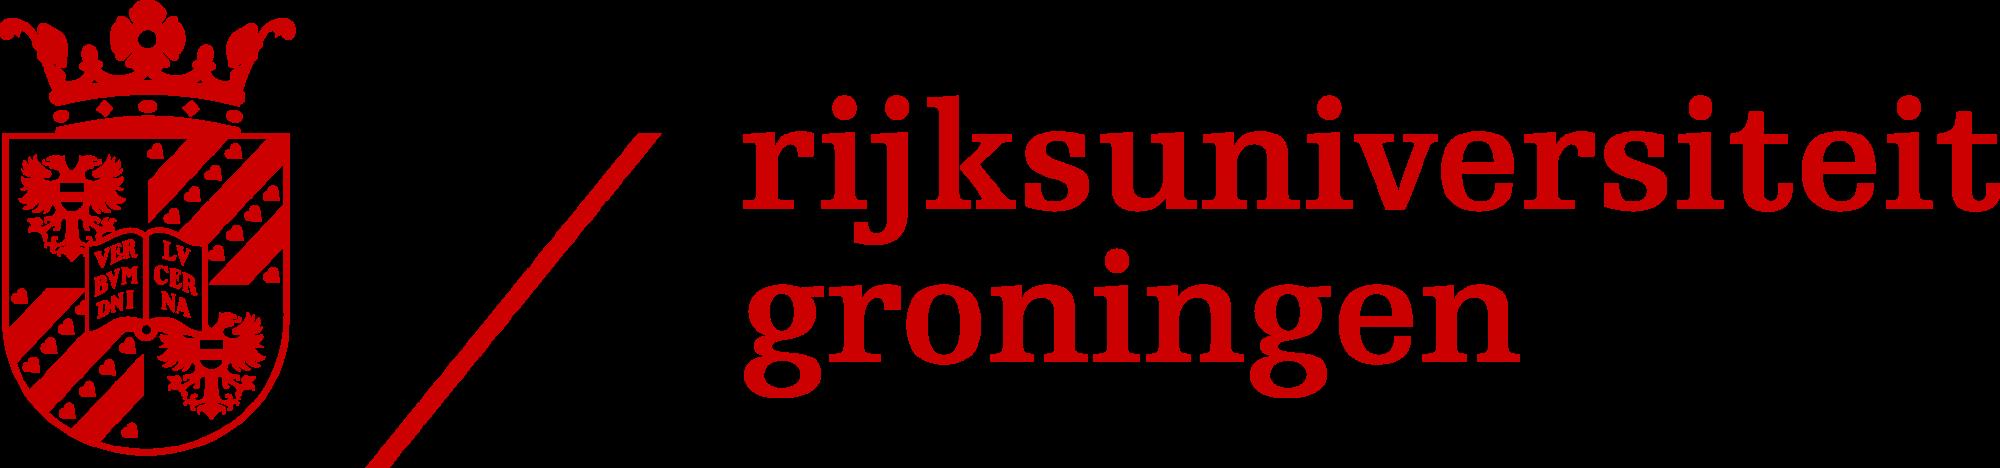 Log Rijksuniversiteit Groningen